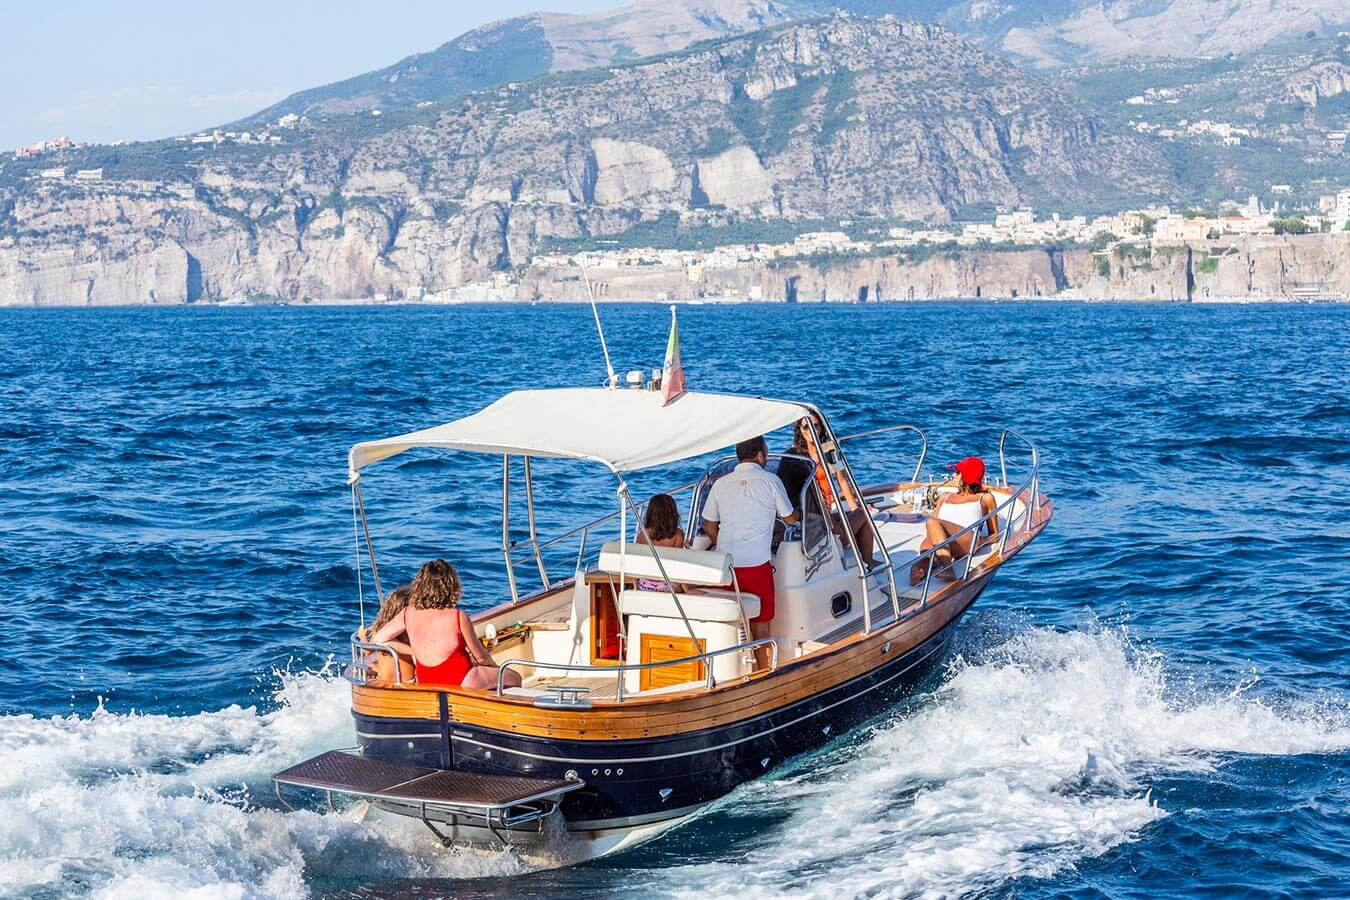 Giro in barca a Capri, tutti i tour imperdibili